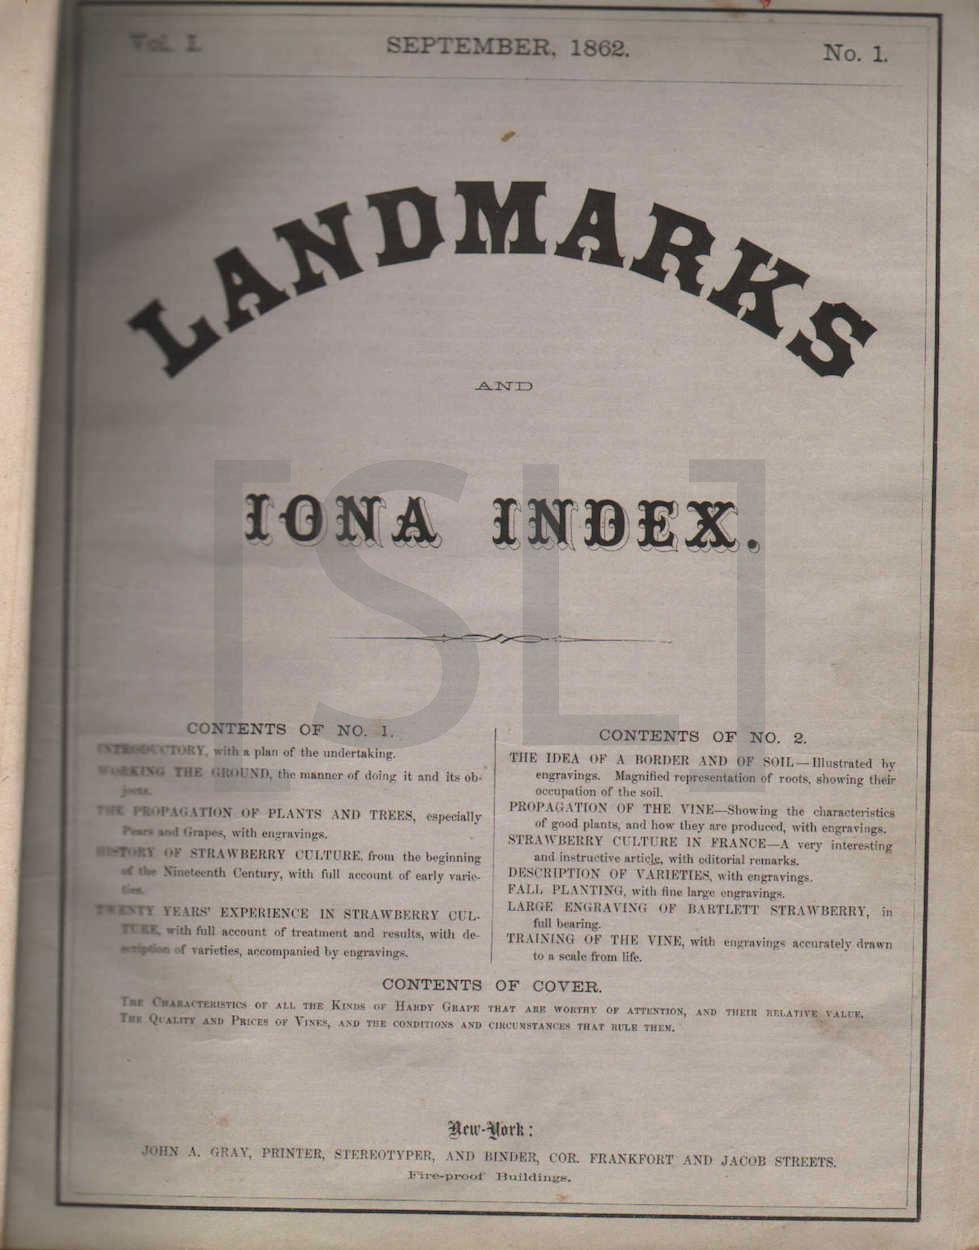 Landmarks and Iona Index